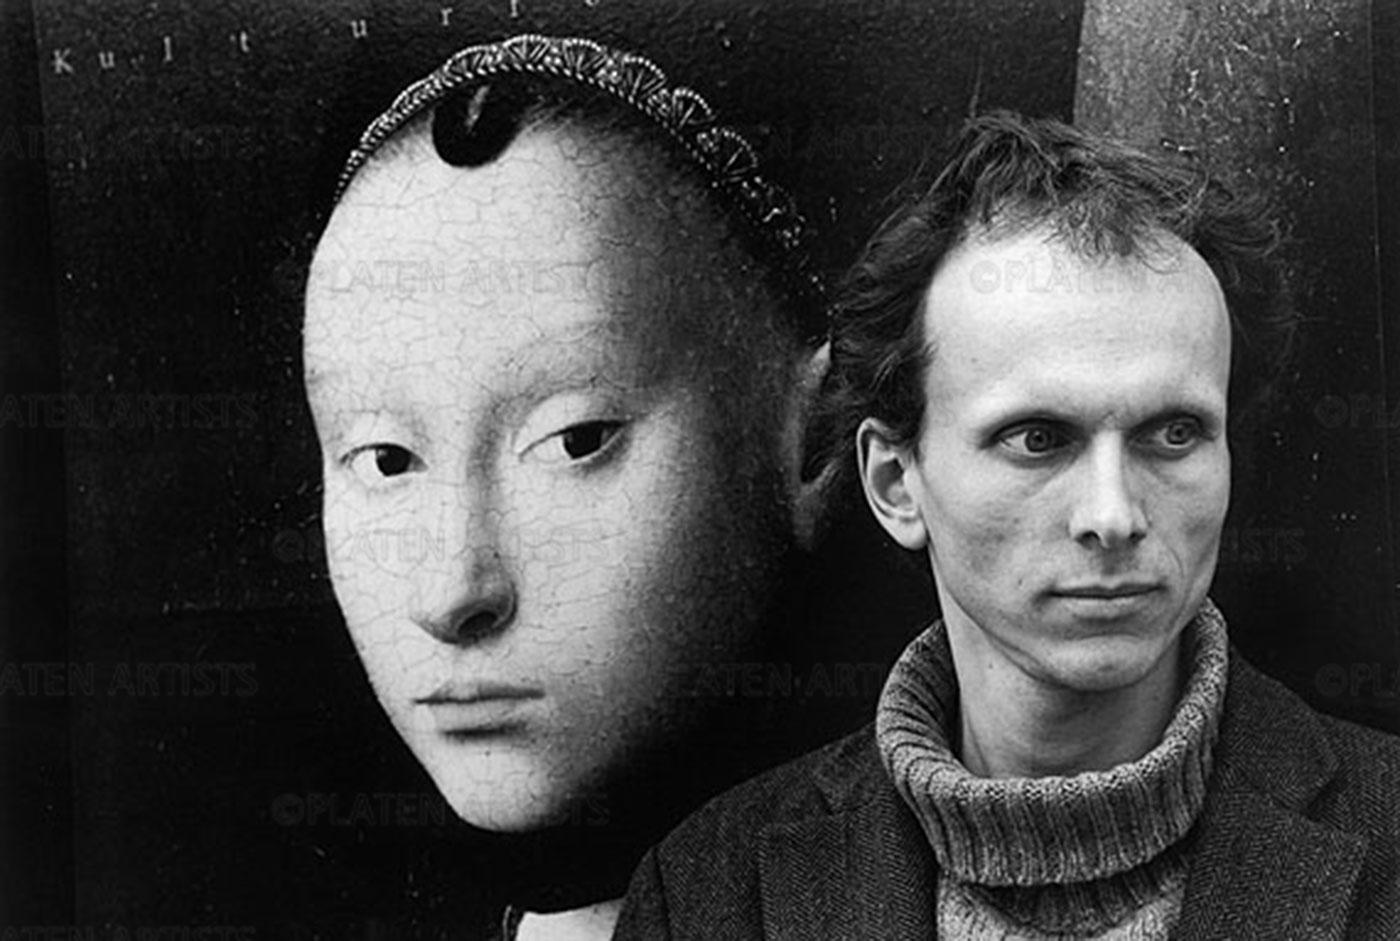 Julian Rosefeldt, Renaissance-Typen, Berlin 2001